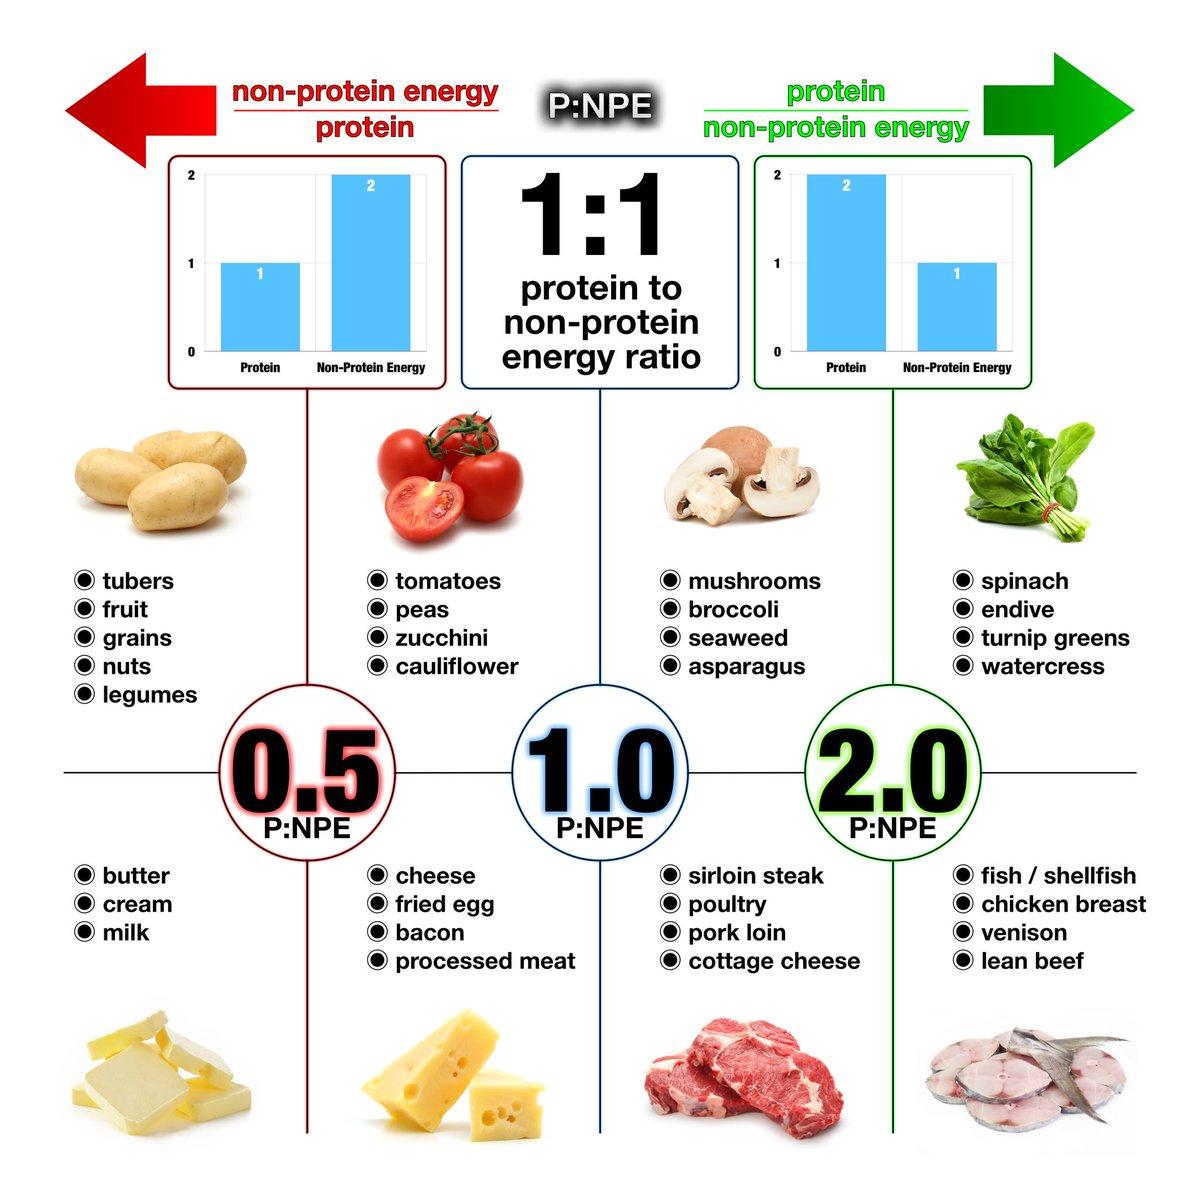 paleo diet fat protein carb ratio